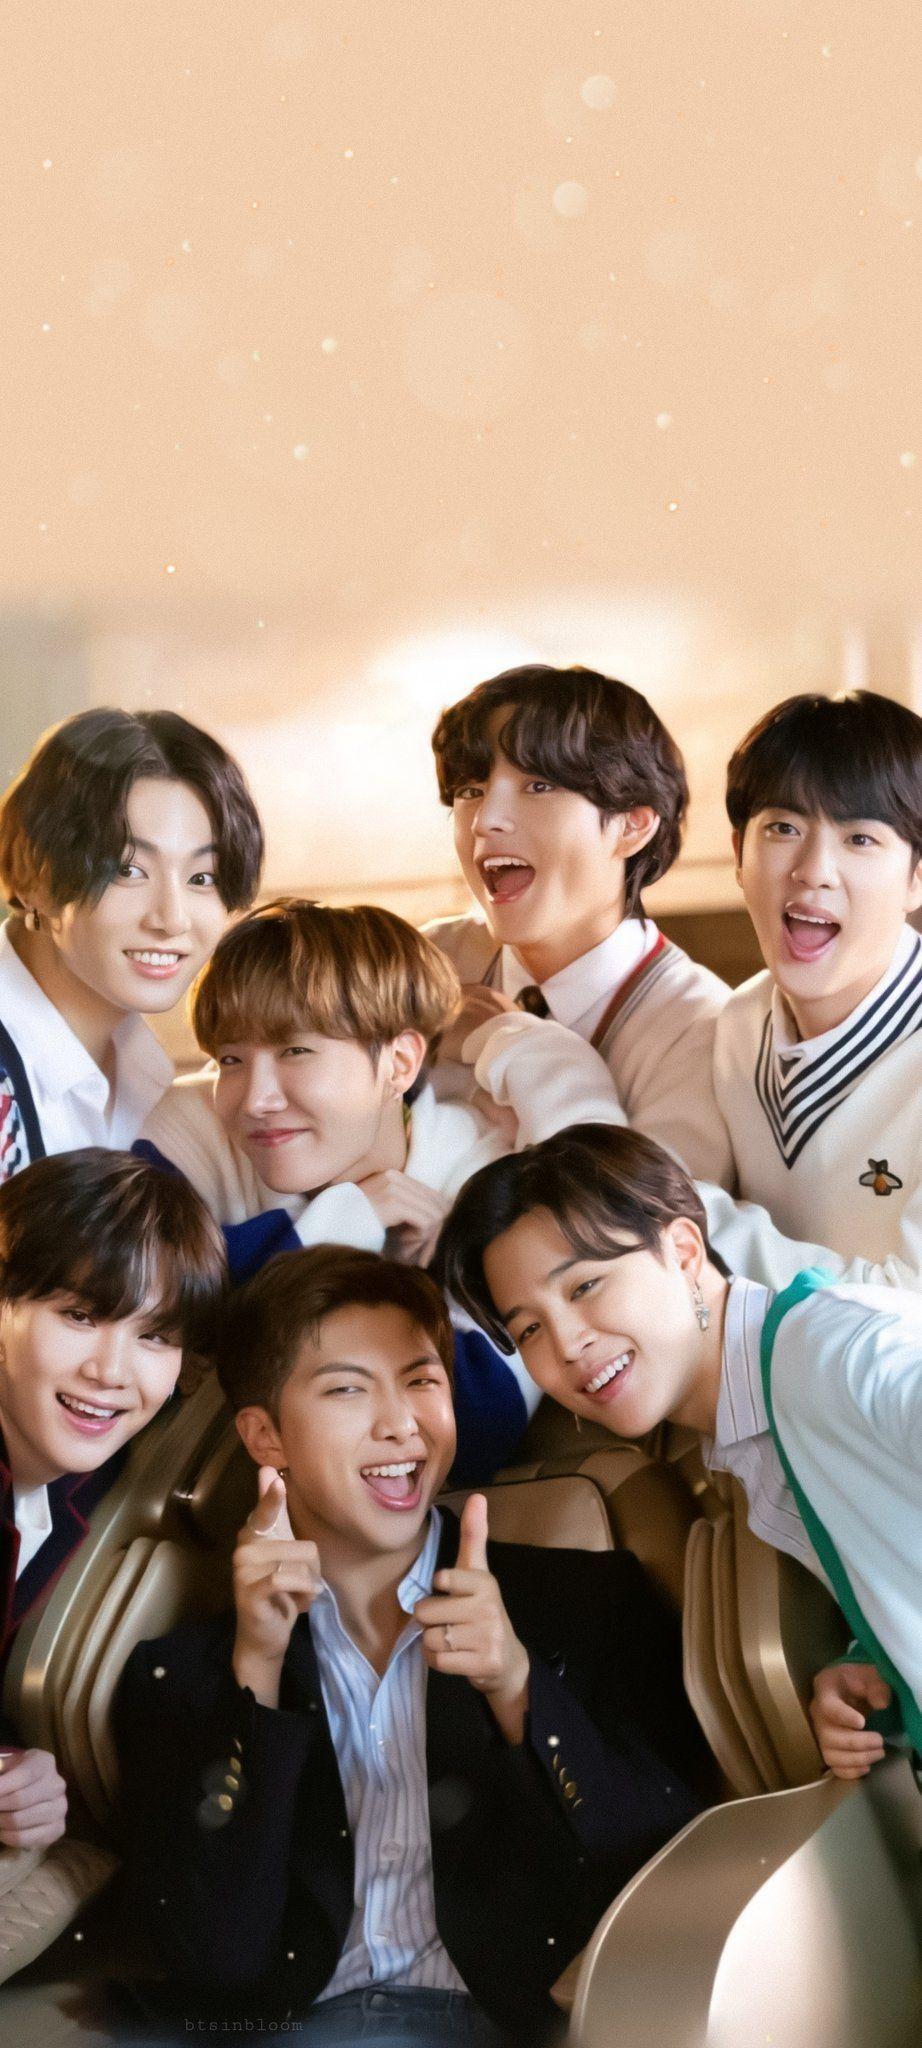 Foto BTS Wallpaper in 20   Foto bts, Bts beautiful, Bts wallpaper